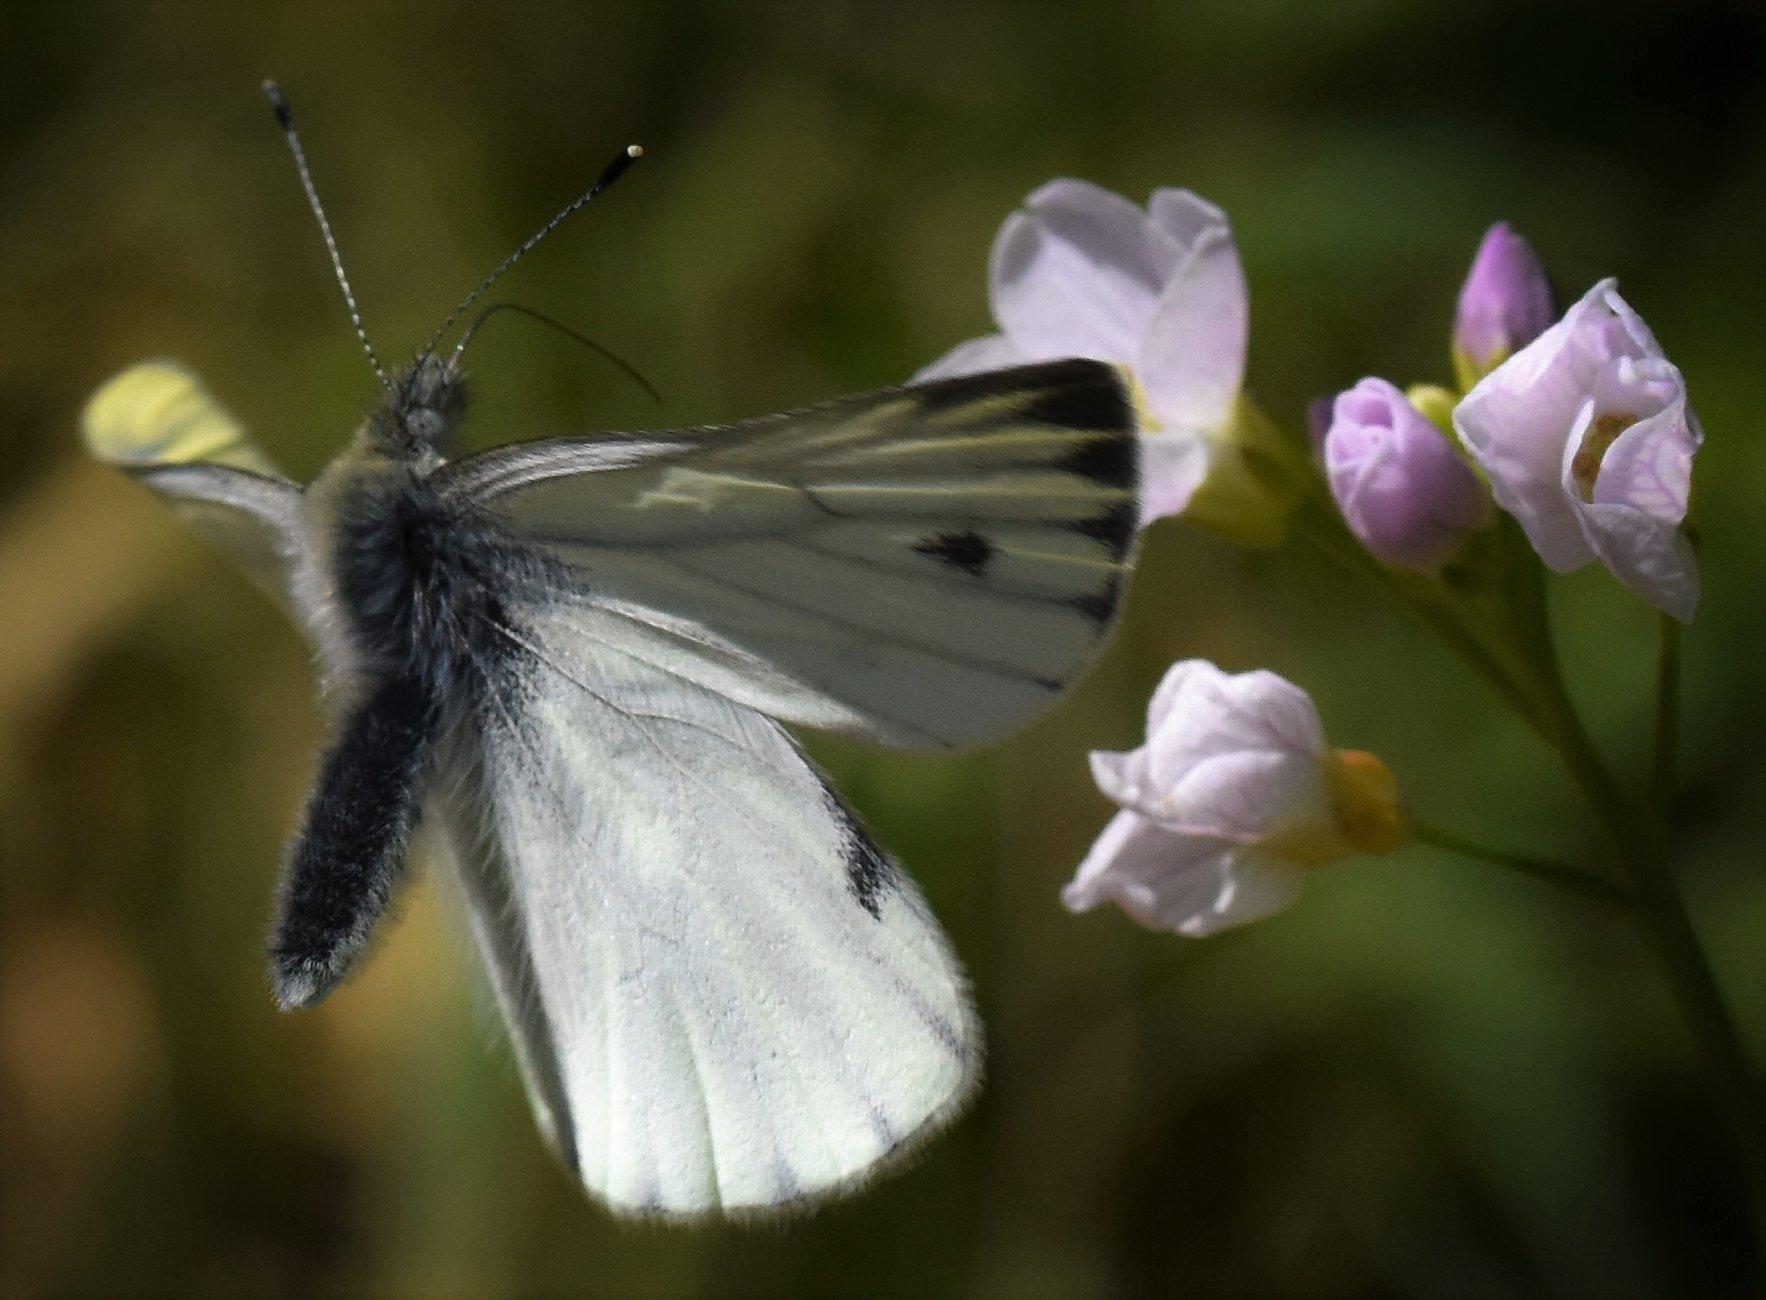 Green Veined White landing on a Cuckoo Flower